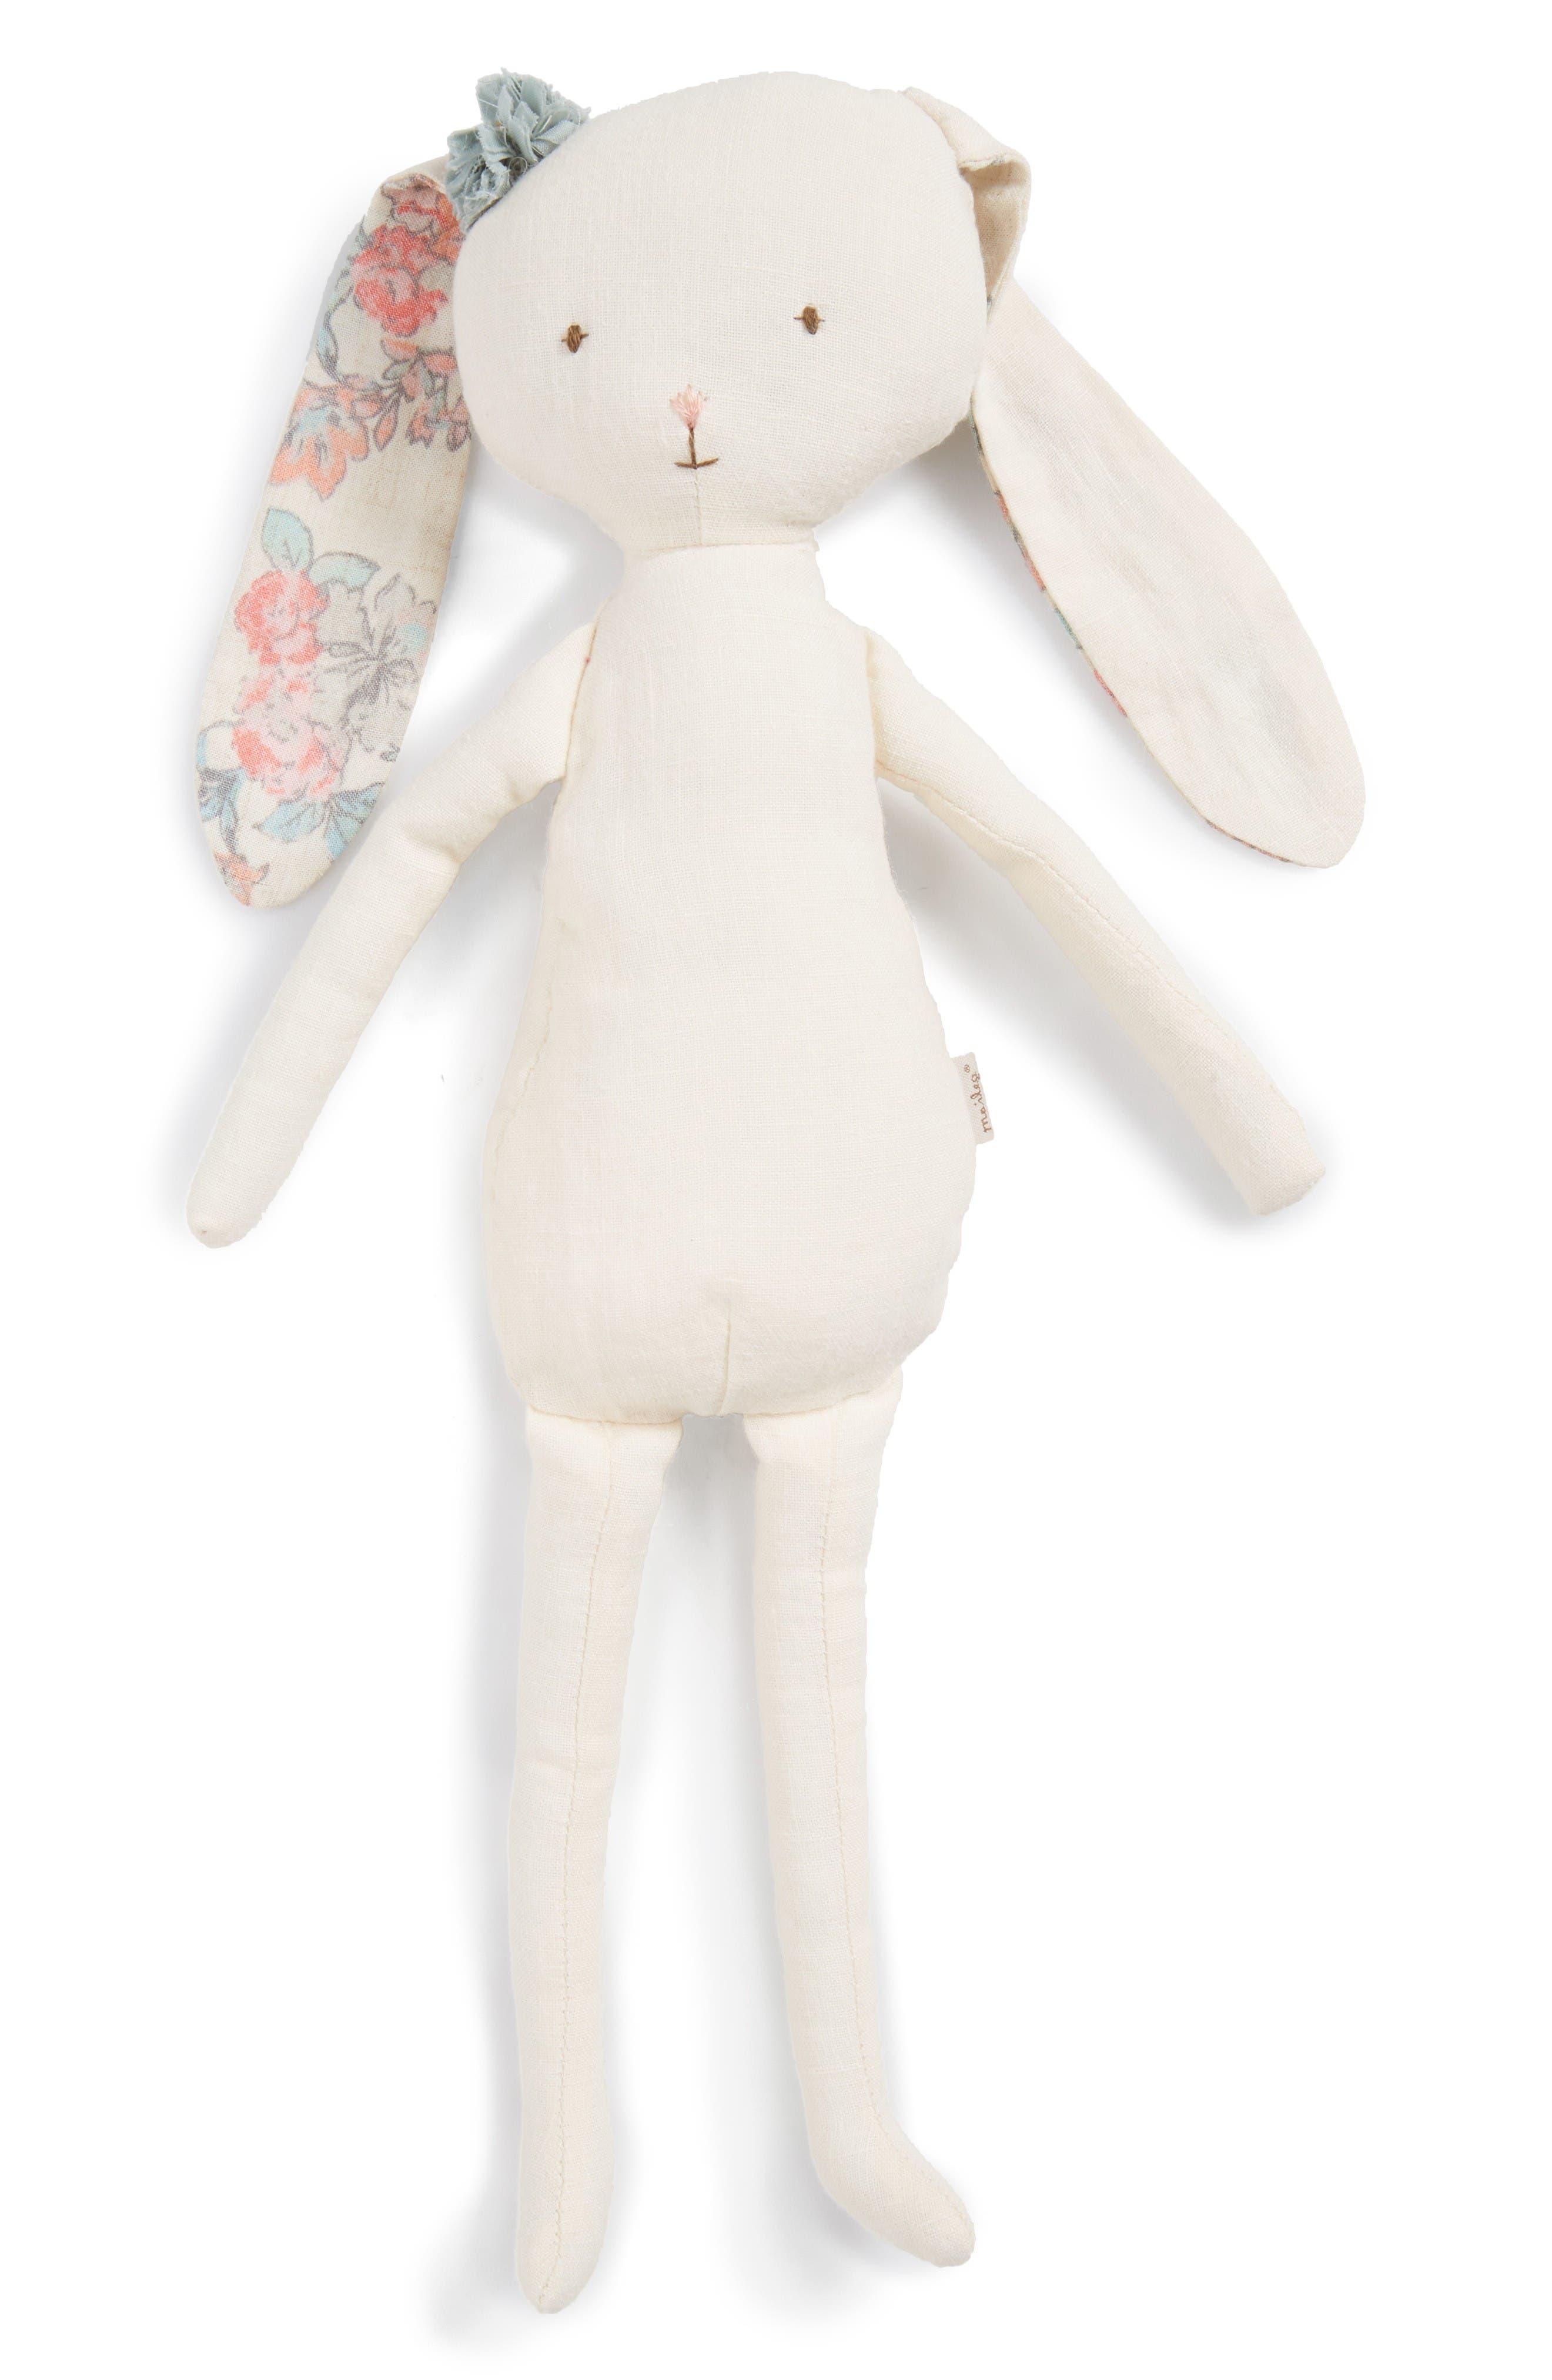 Best Friends Bunny Stuffed Animal,                         Main,                         color, Multi